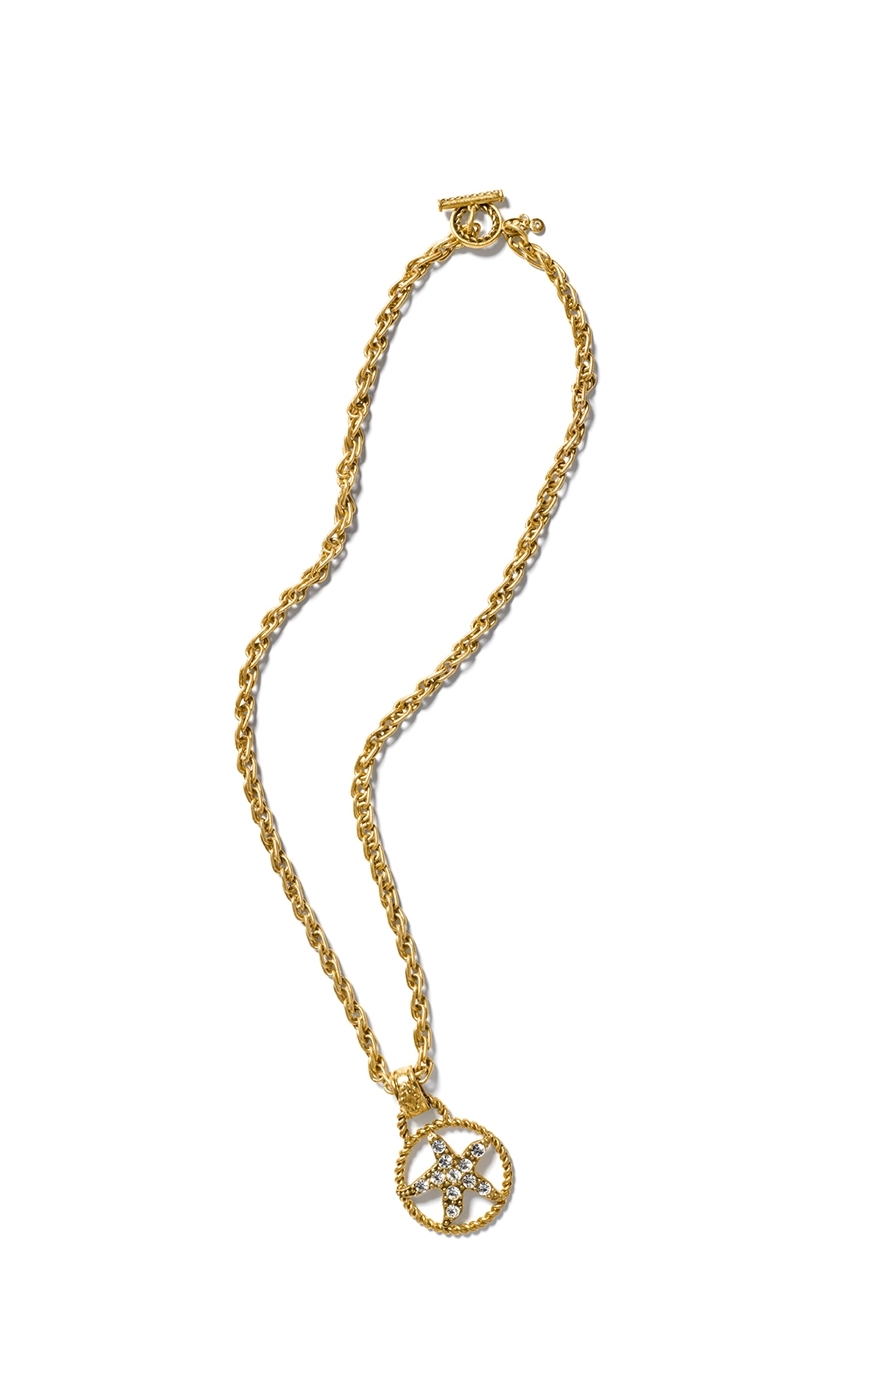 cabi's Starfish Medallion Necklace